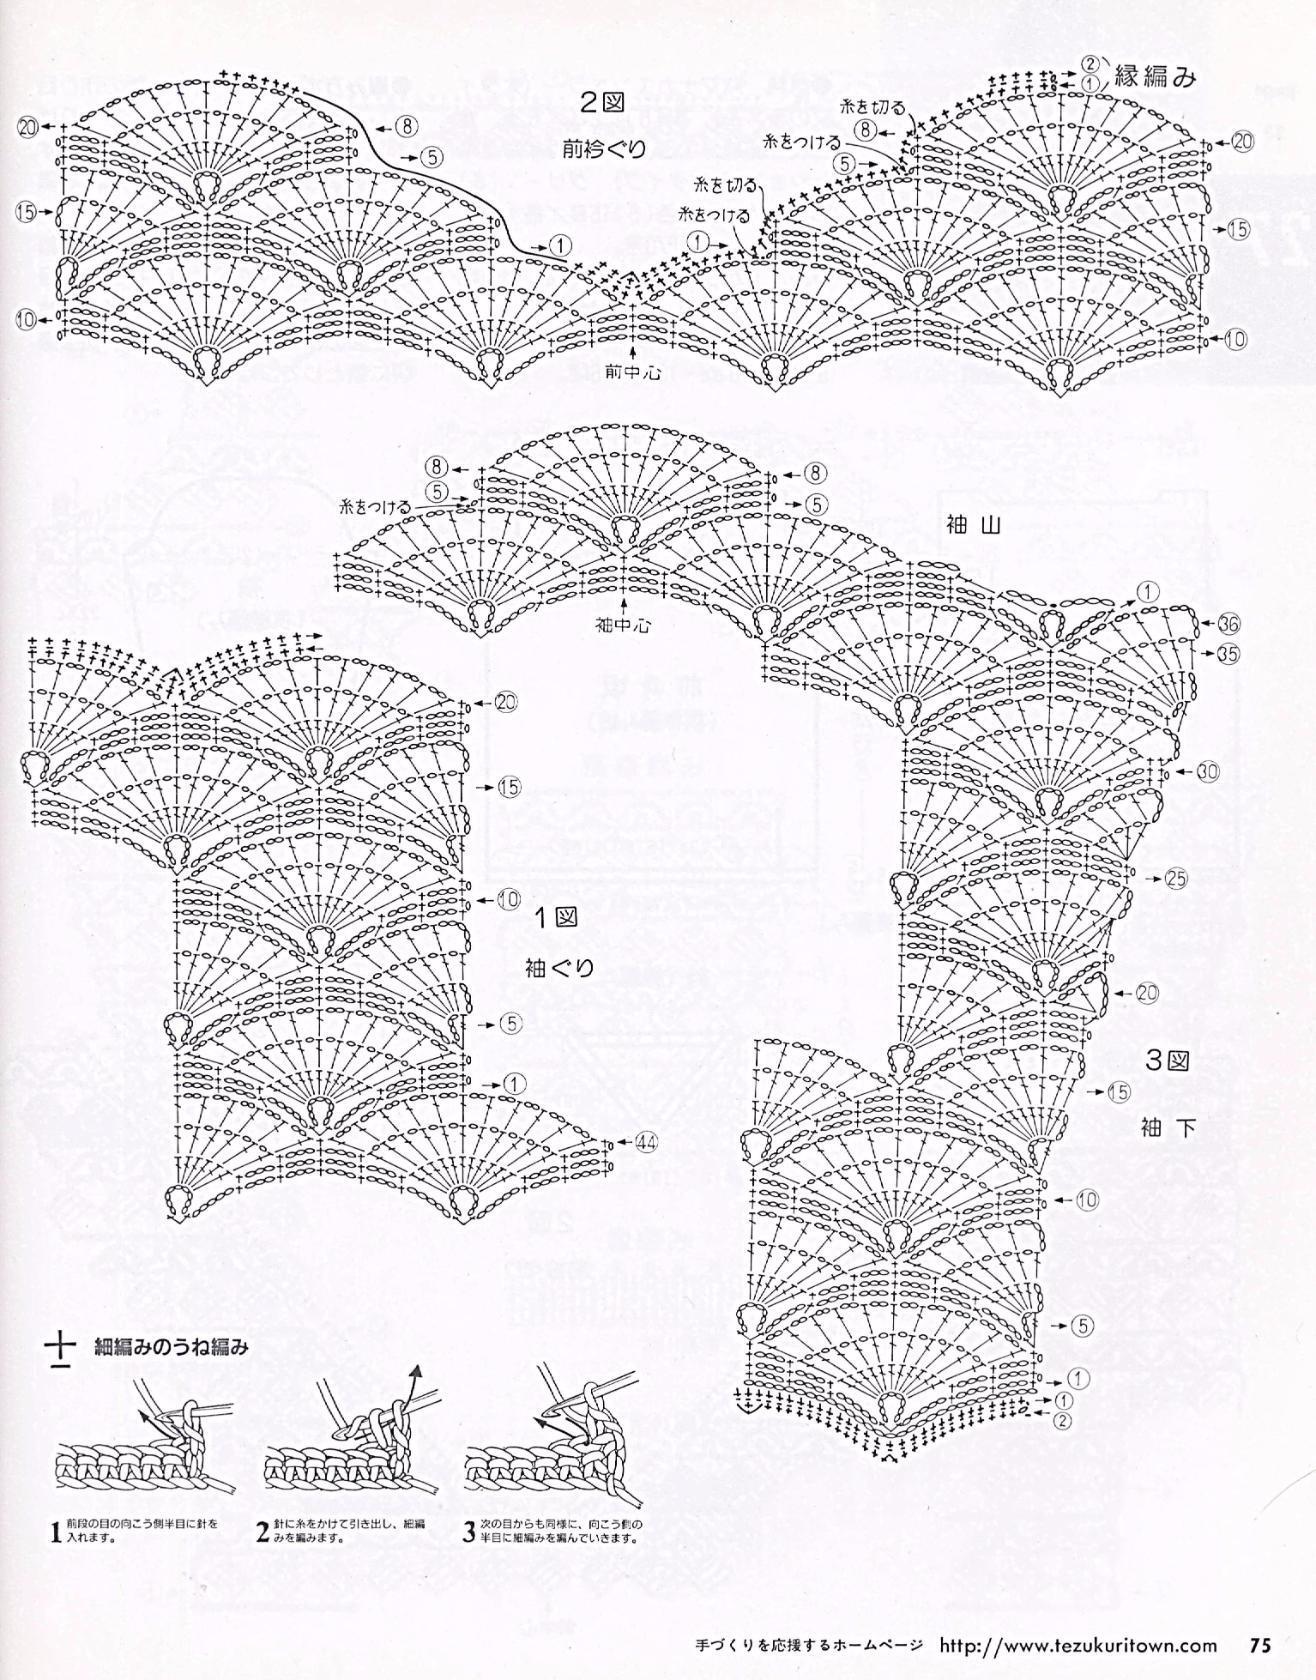 Blusa a crochet con esquemas media manga1